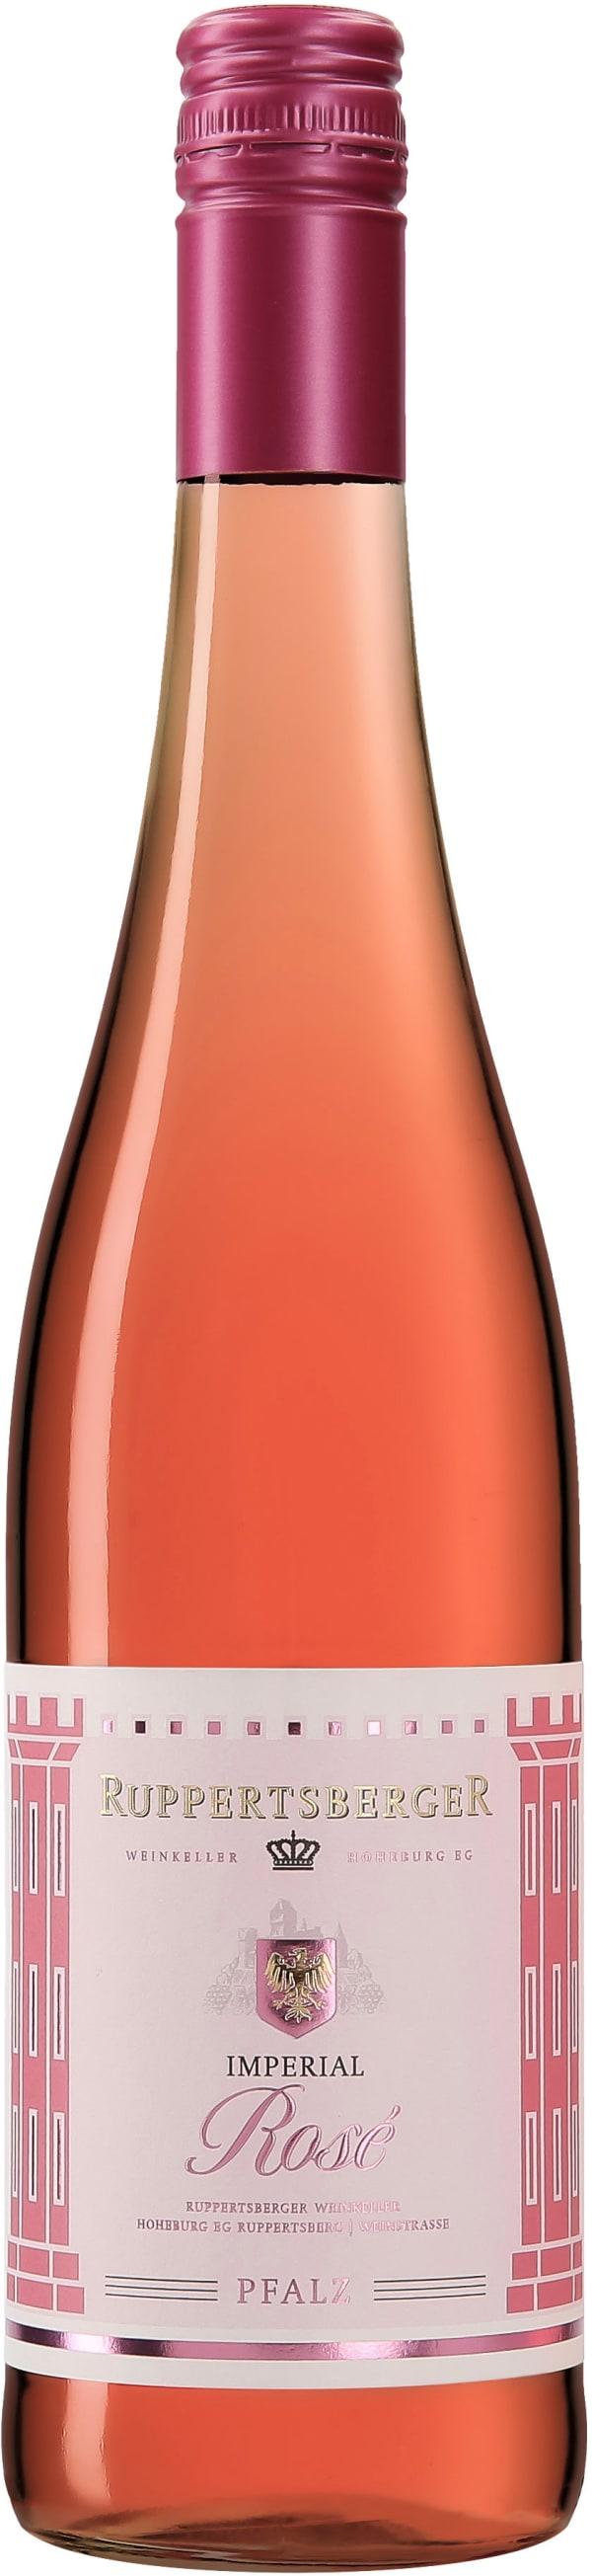 Ruppertsberger Imperial Rosé 2020